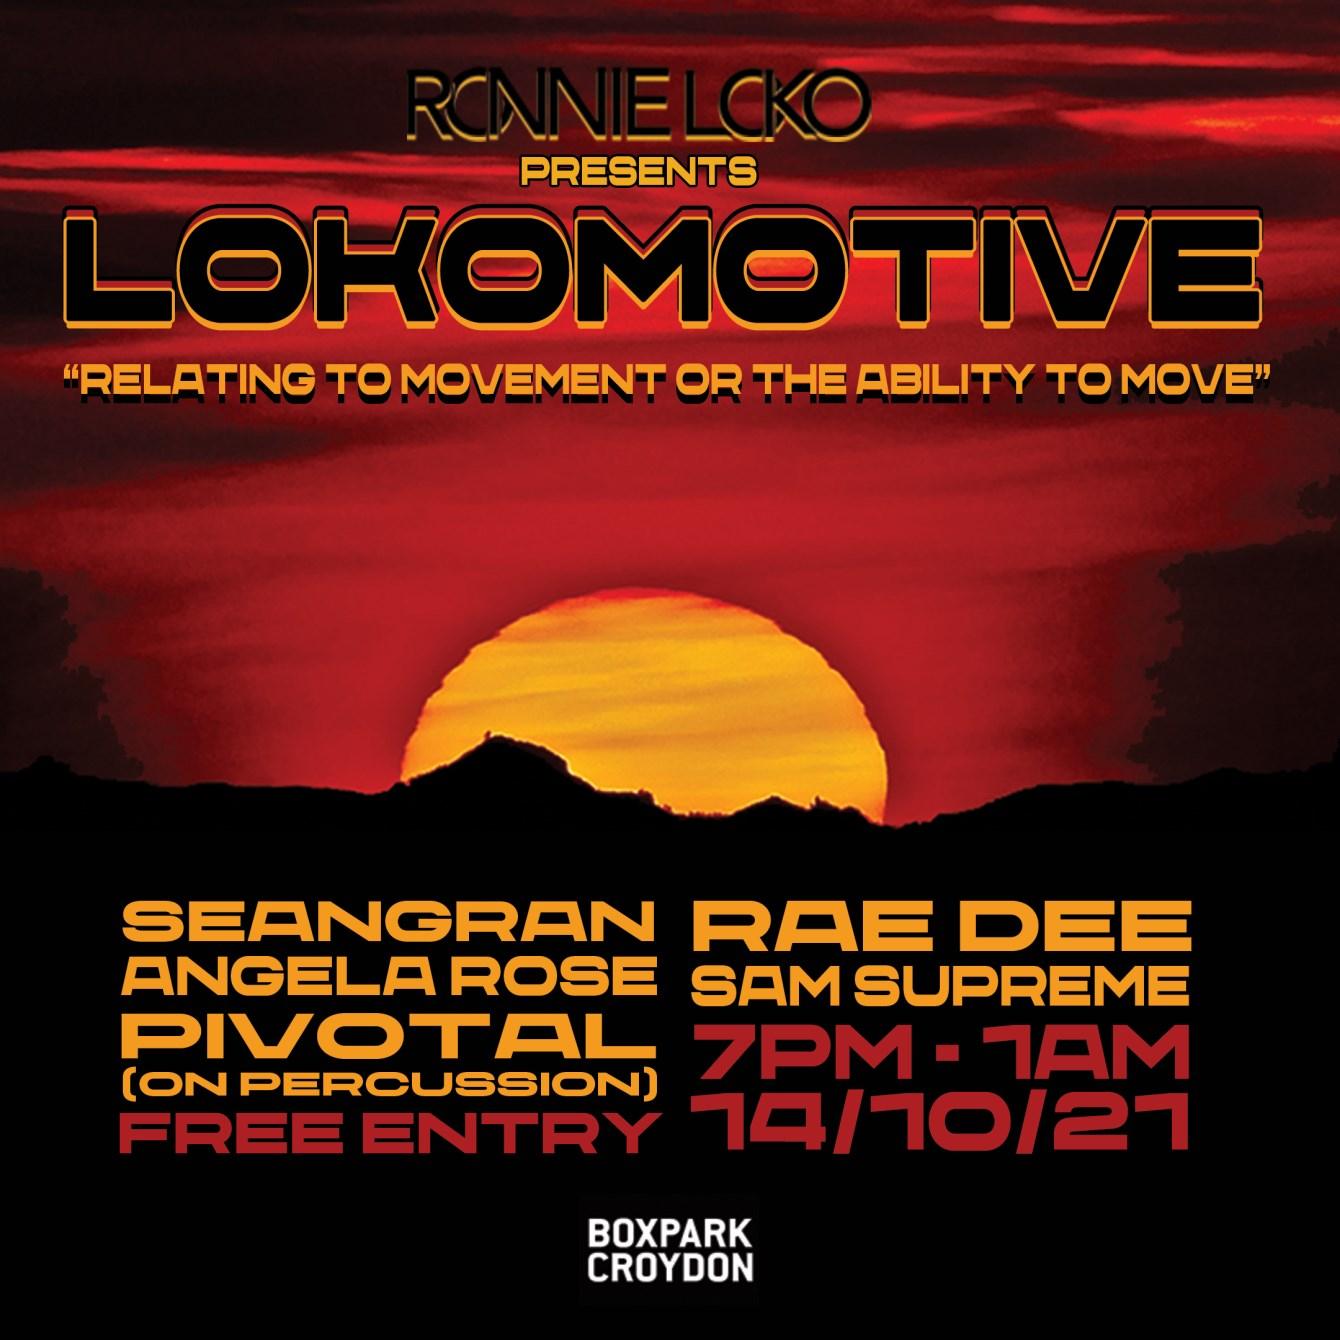 Ronnie Loko presents Lokomotive - Flyer front